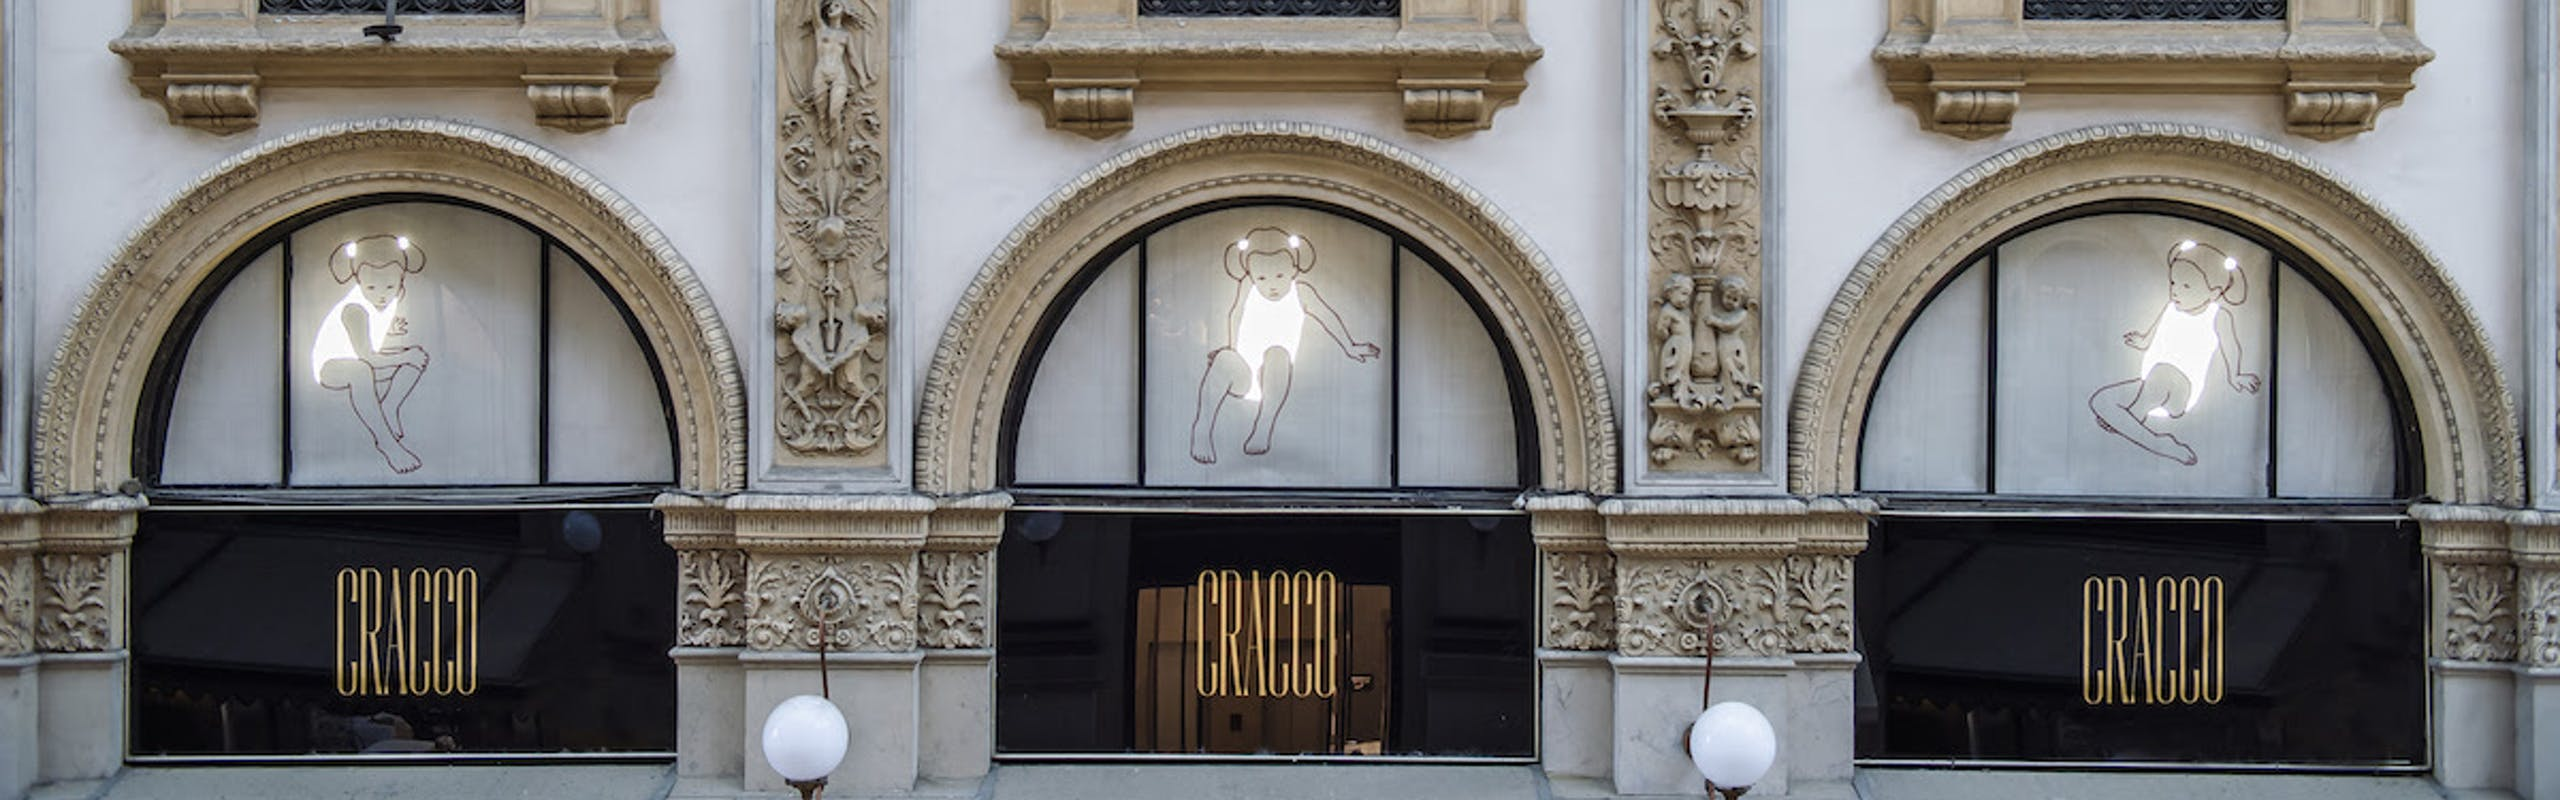 Valerio Berretti accende Galleria Cracco